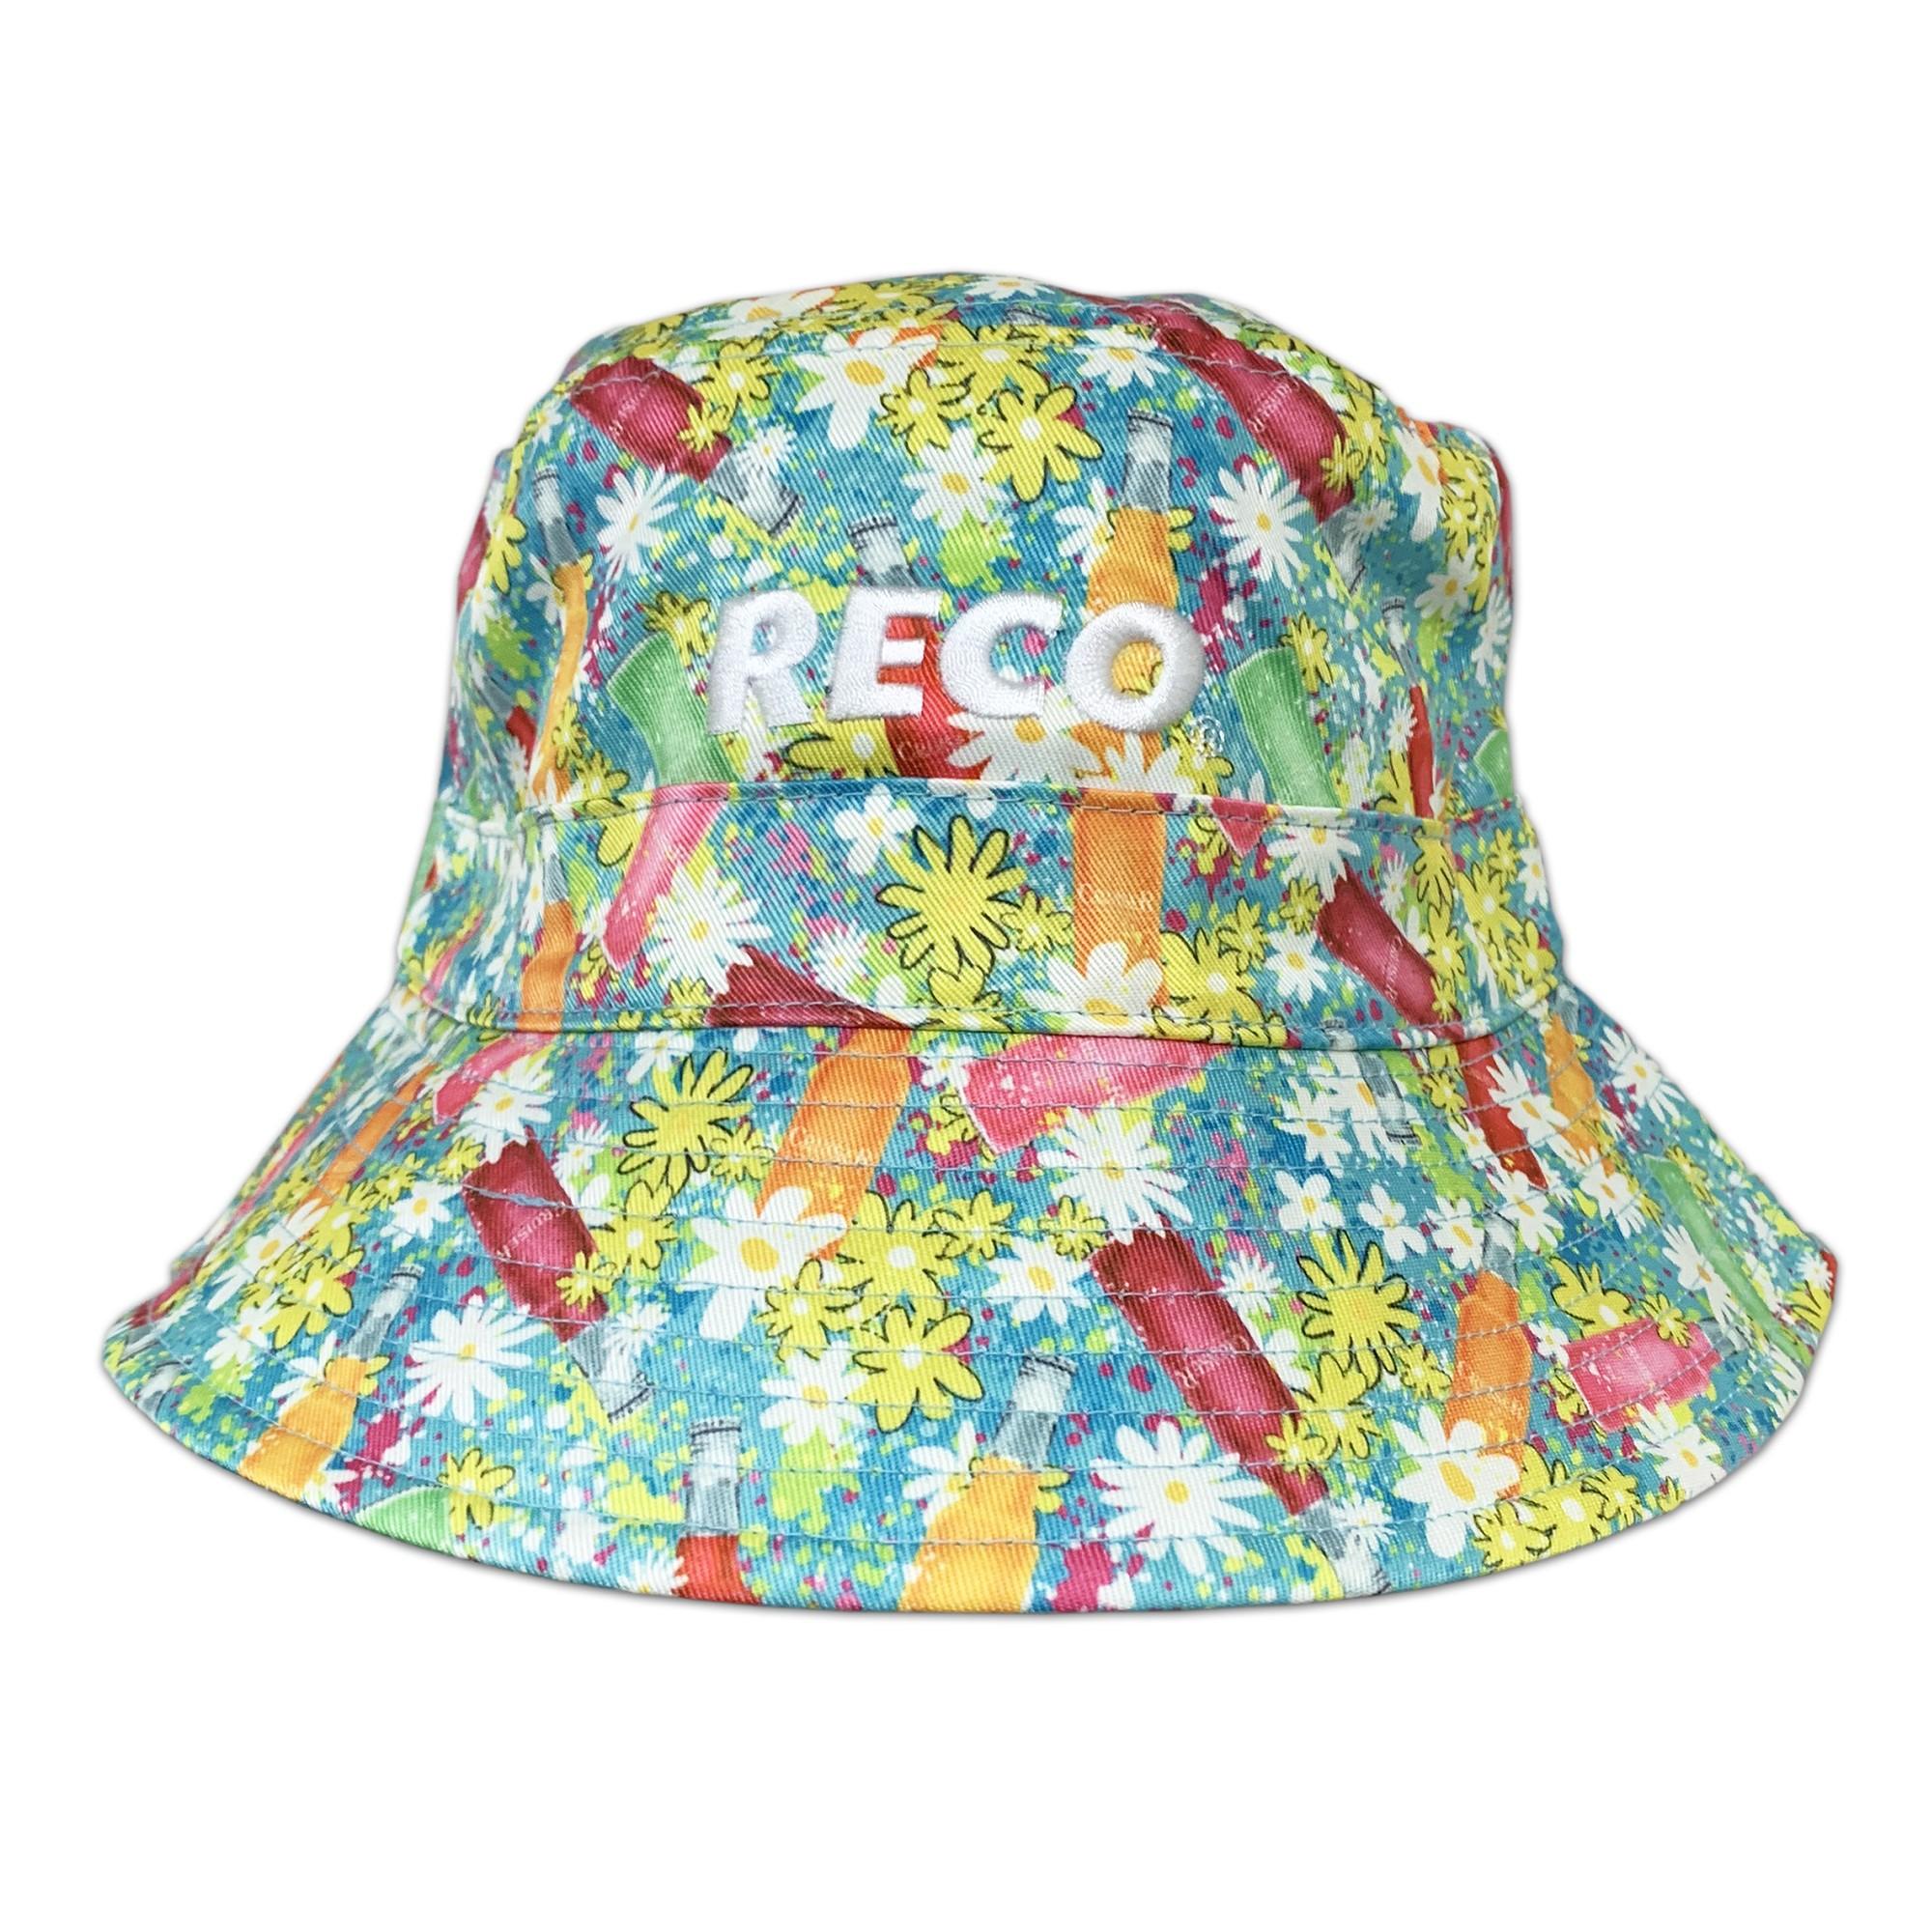 BOOZE CRUISE REVERSIBLE BUCKET HAT